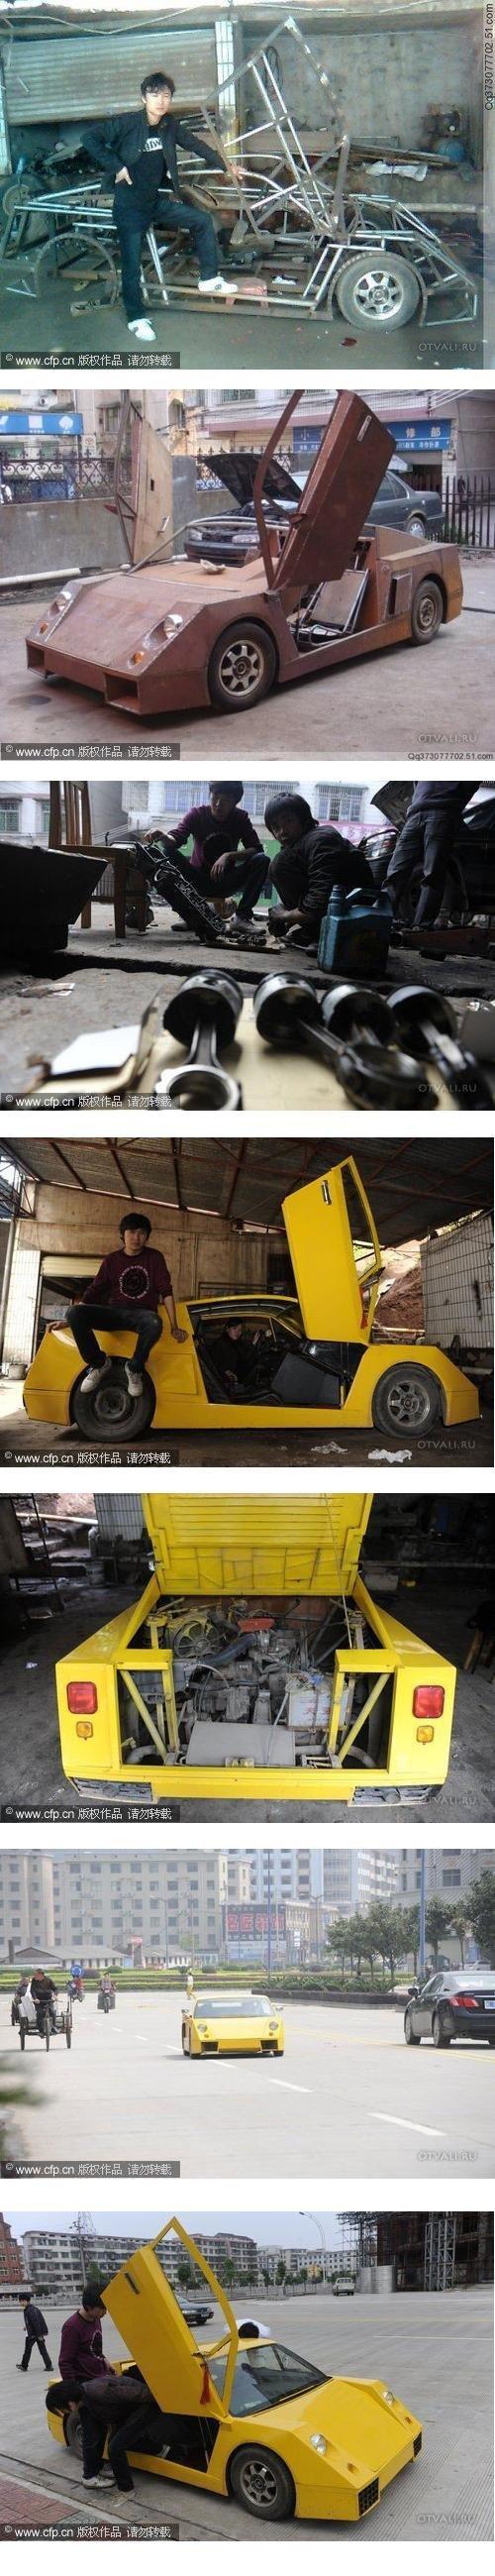 Homemade Lamborghini. In communist China you make your own Lamborghini<br /> Thumbs?. Eib. mhe cfp. cra. Milfy/ aila 'atw% tit. looks like a lego version communist china Homemade car Lamborghini